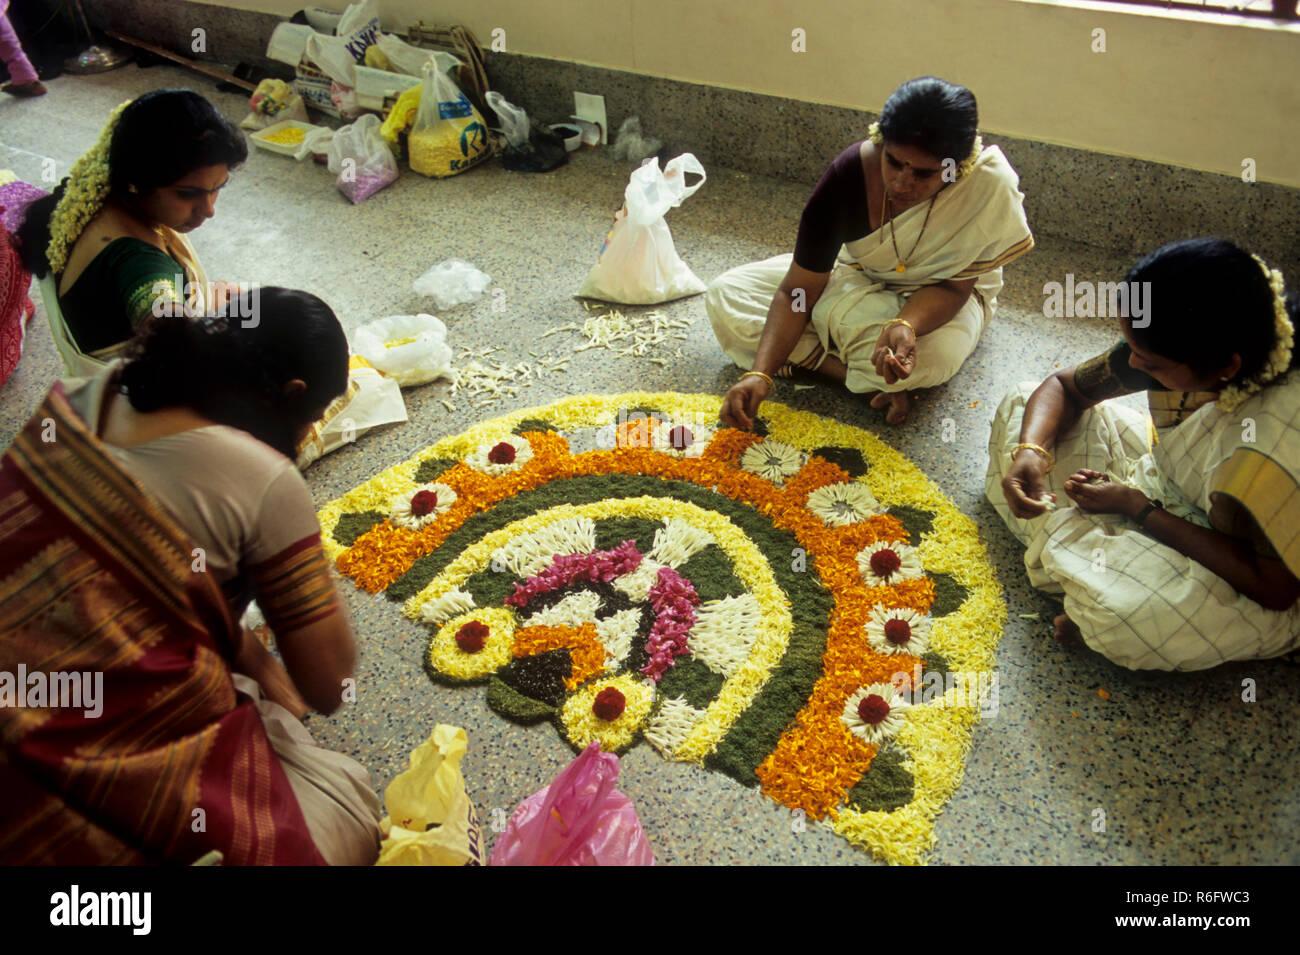 pookalam, floral design, onam festival, kerala, india - Stock Image